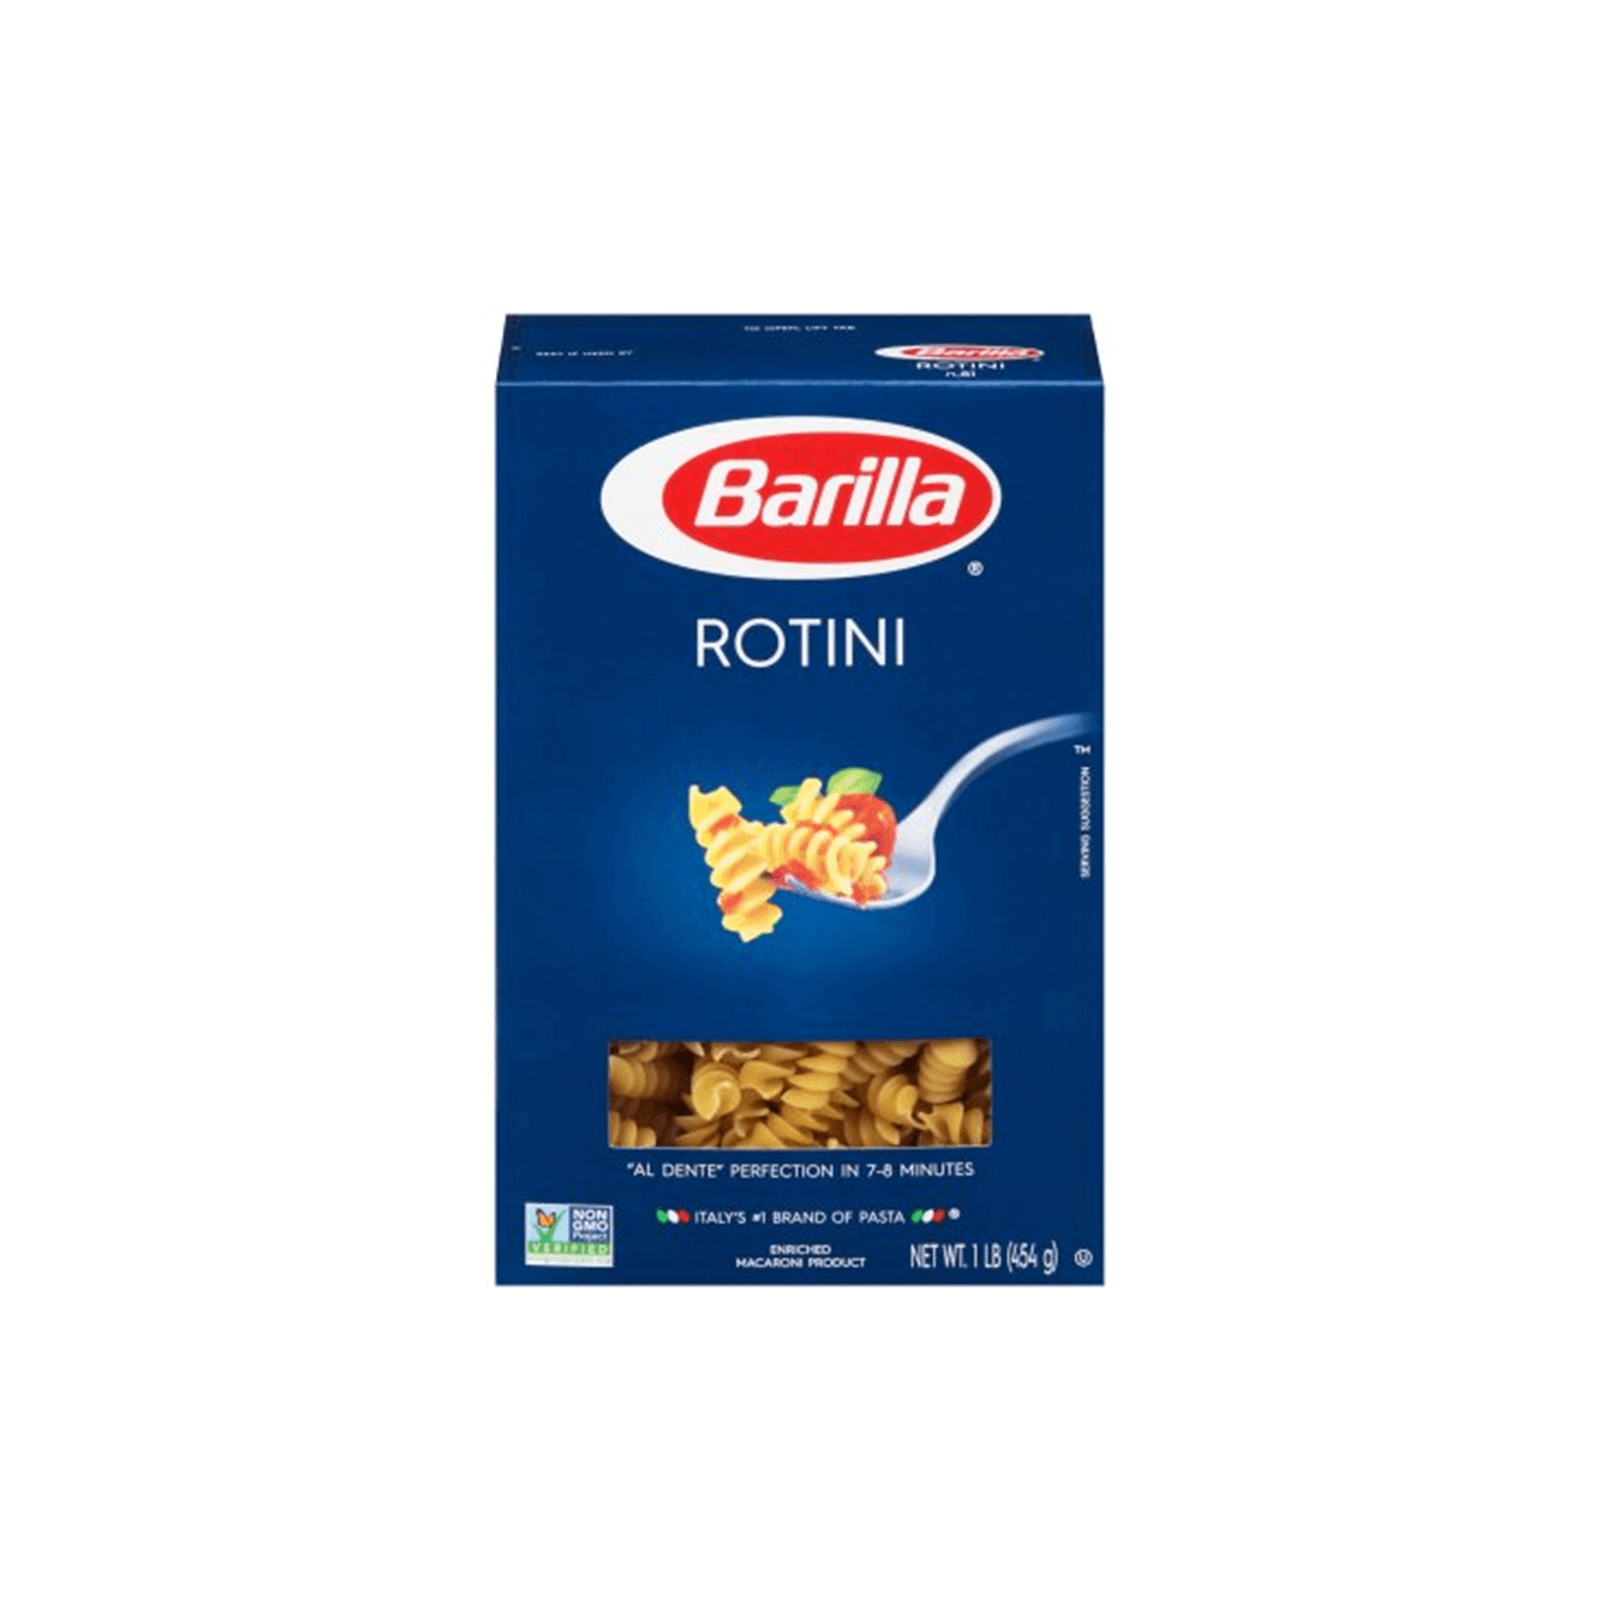 Rotini Barilla